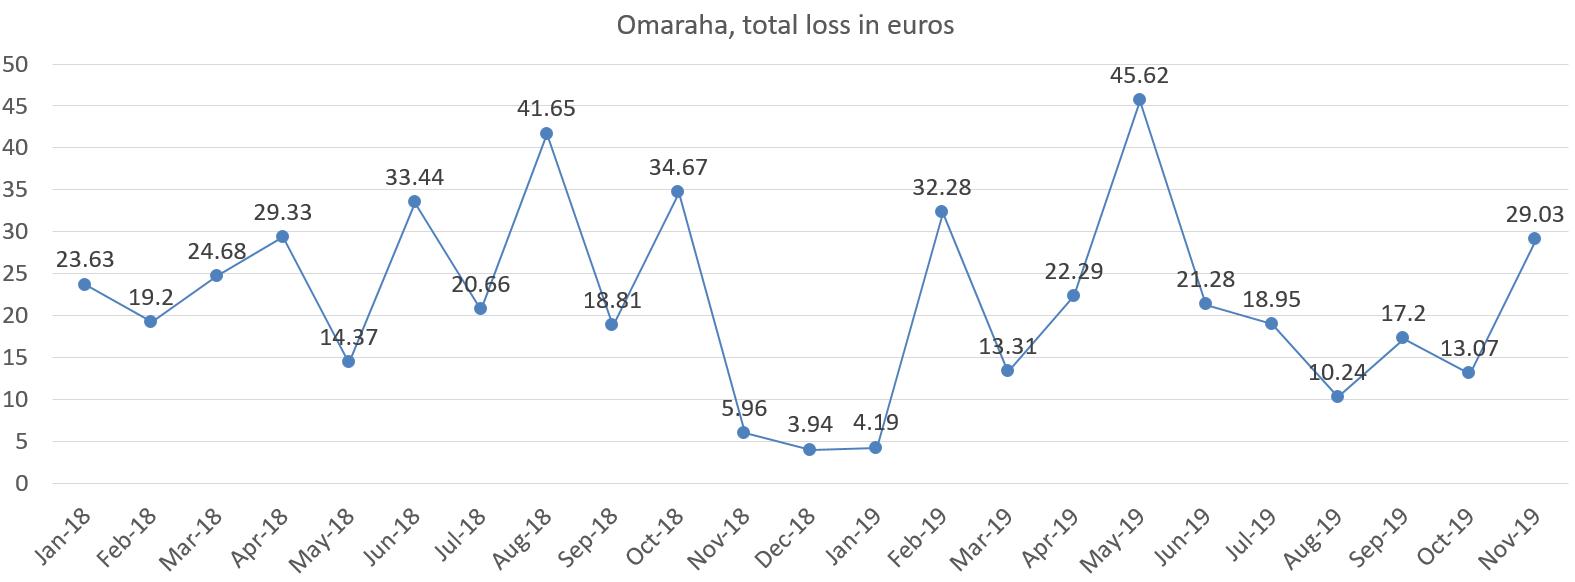 Omaha total loss in euros november 2019